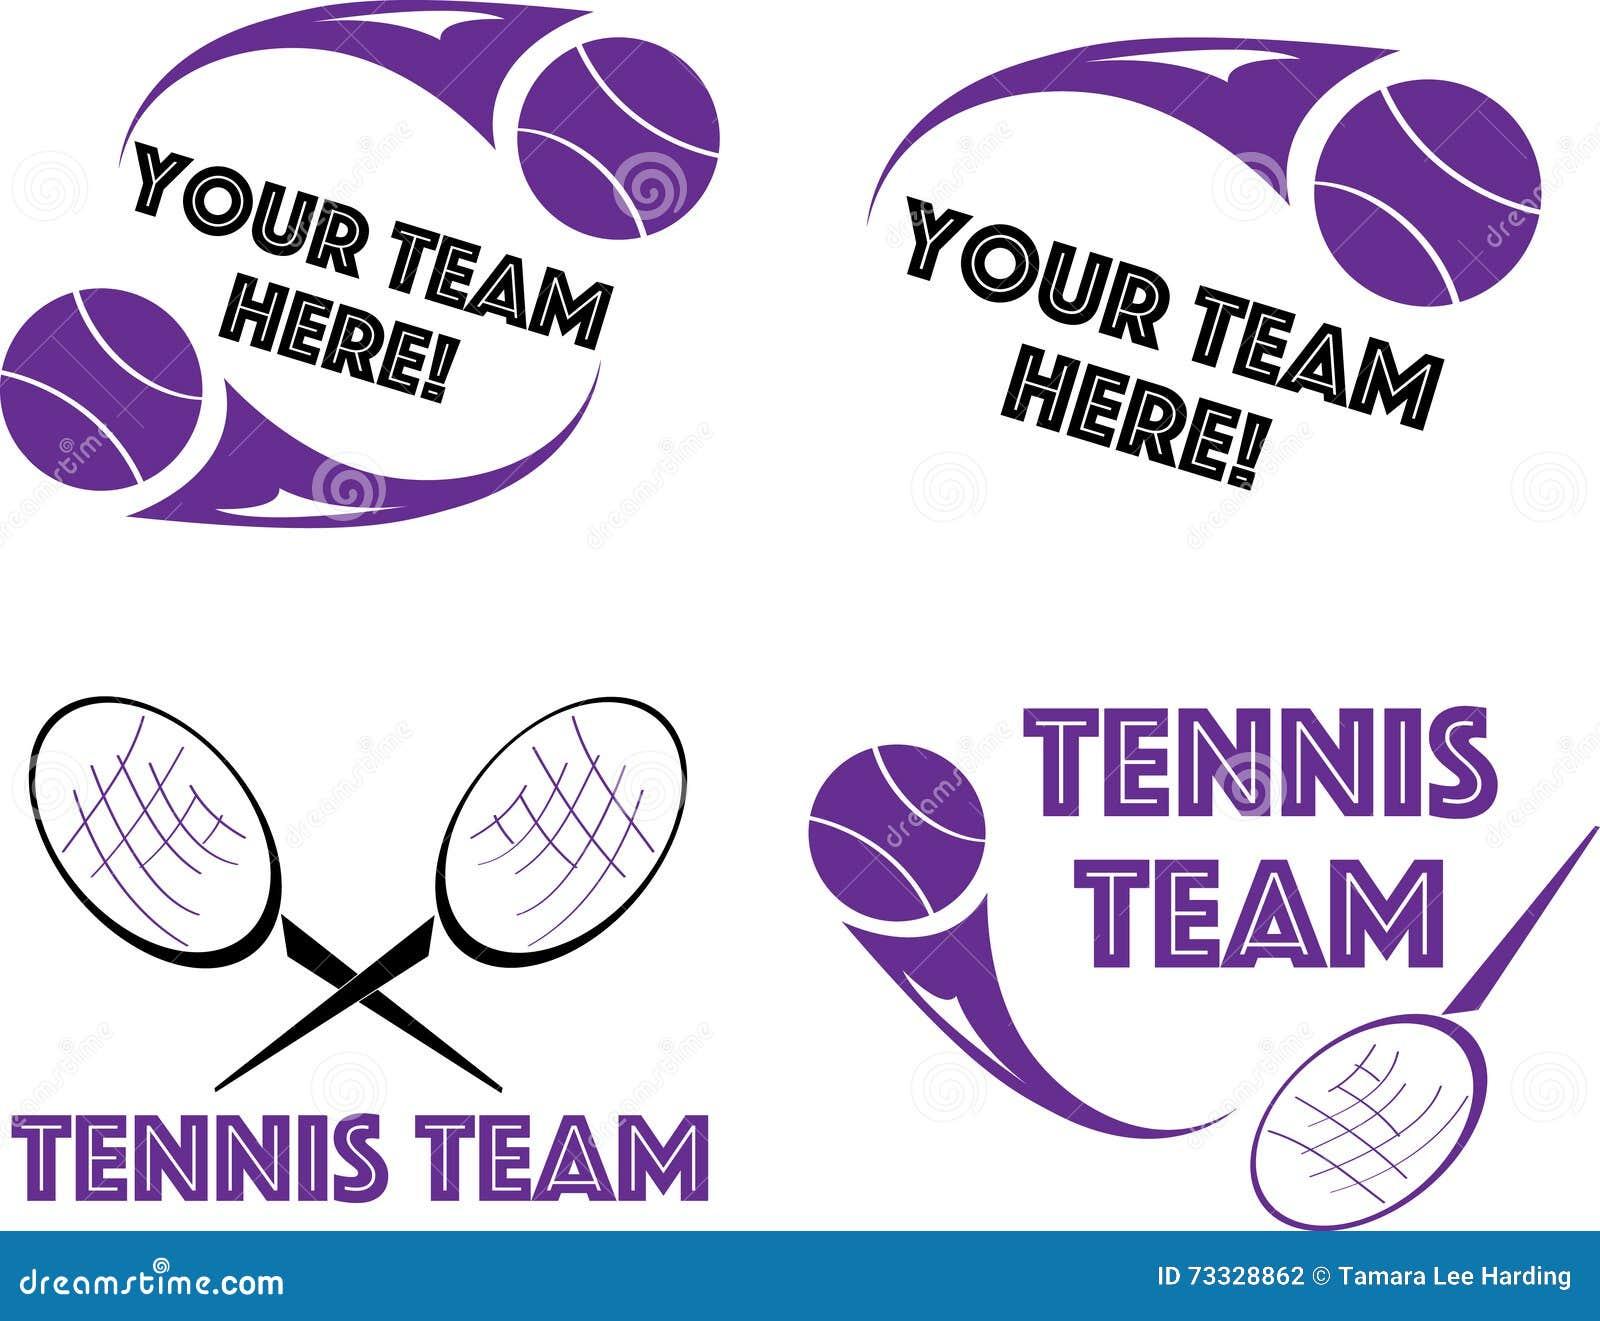 Tennis Logo Free Vector Art  10612 Free Downloads